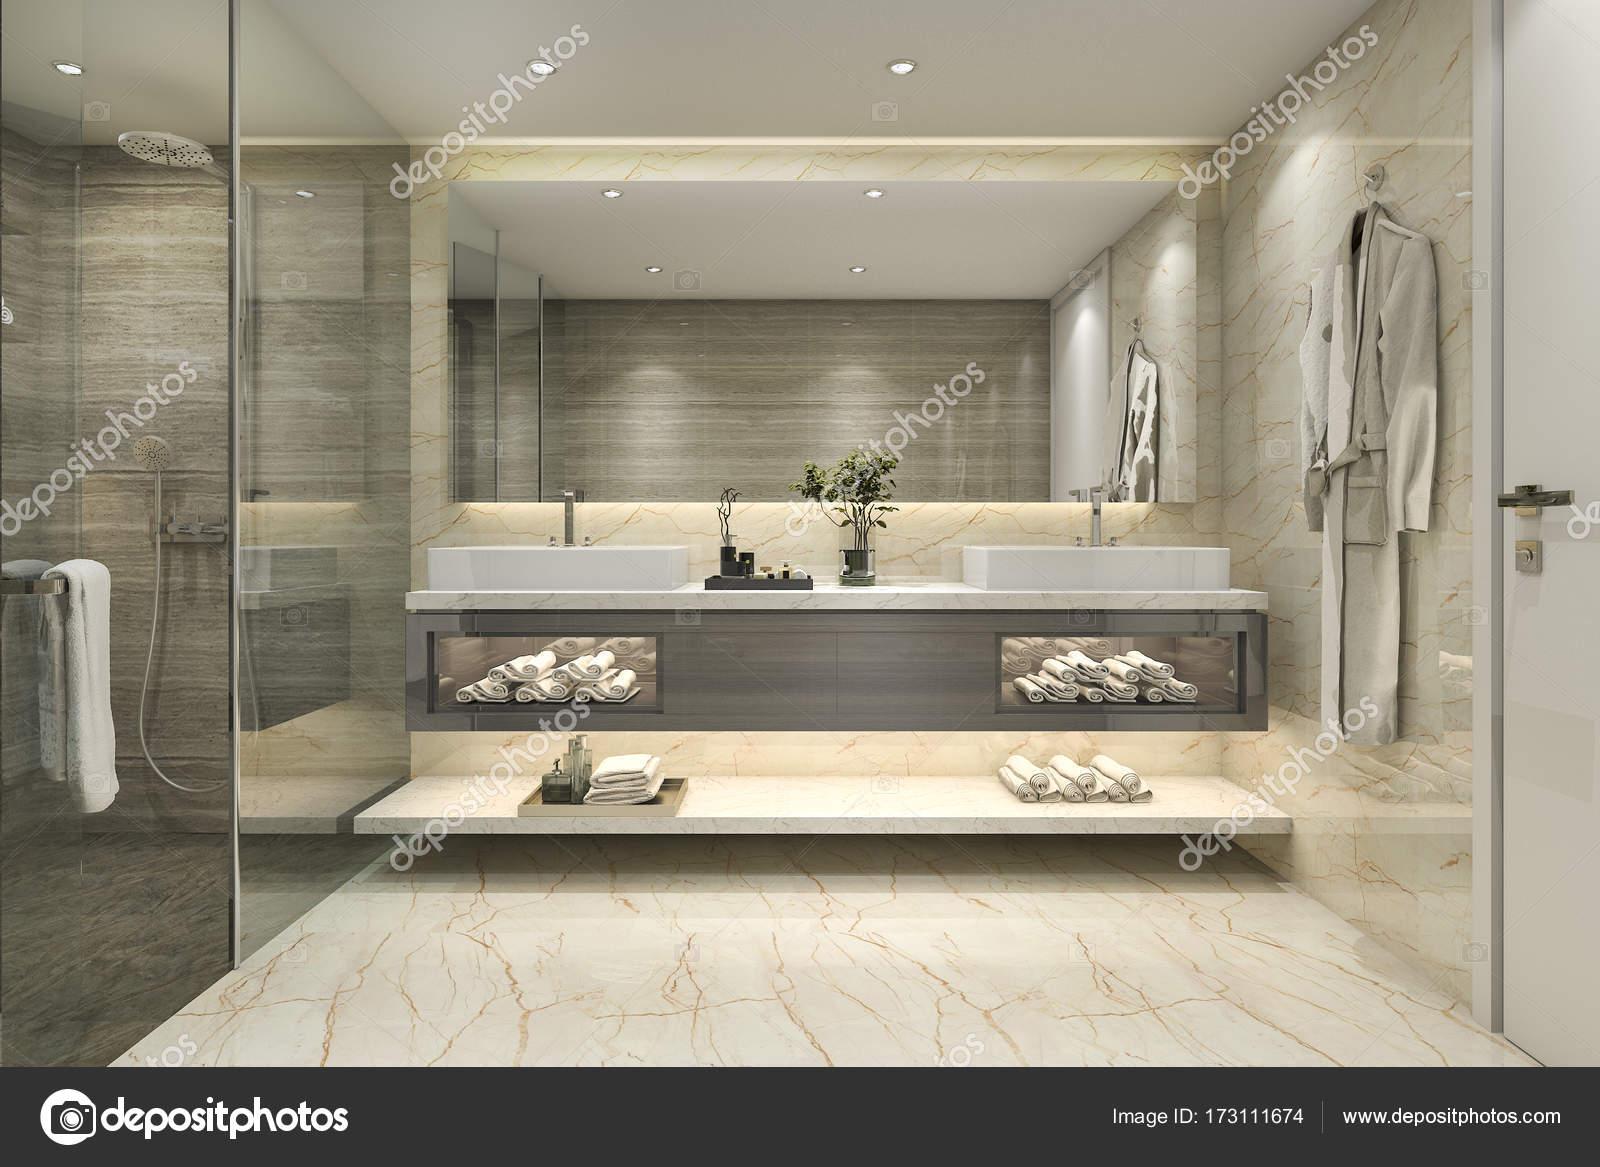 Cuartos de baño lujosos | 3D representación clásico cuarto de baño ...